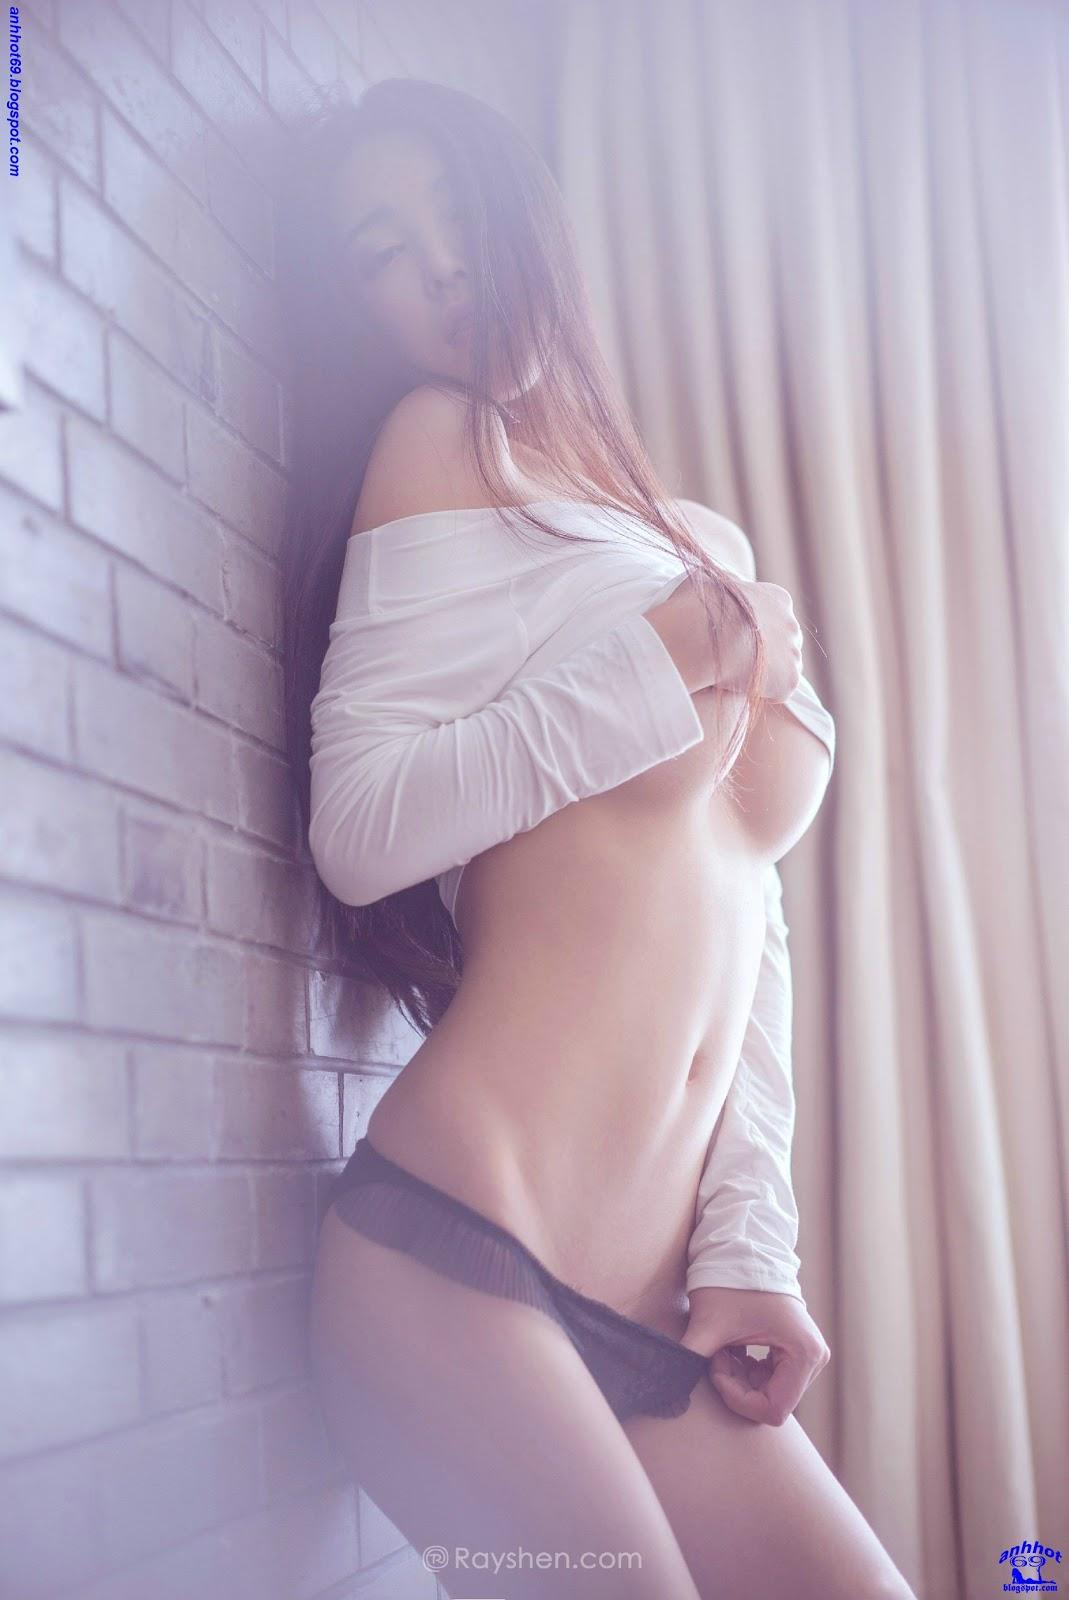 Chen_Darongl_150716_05